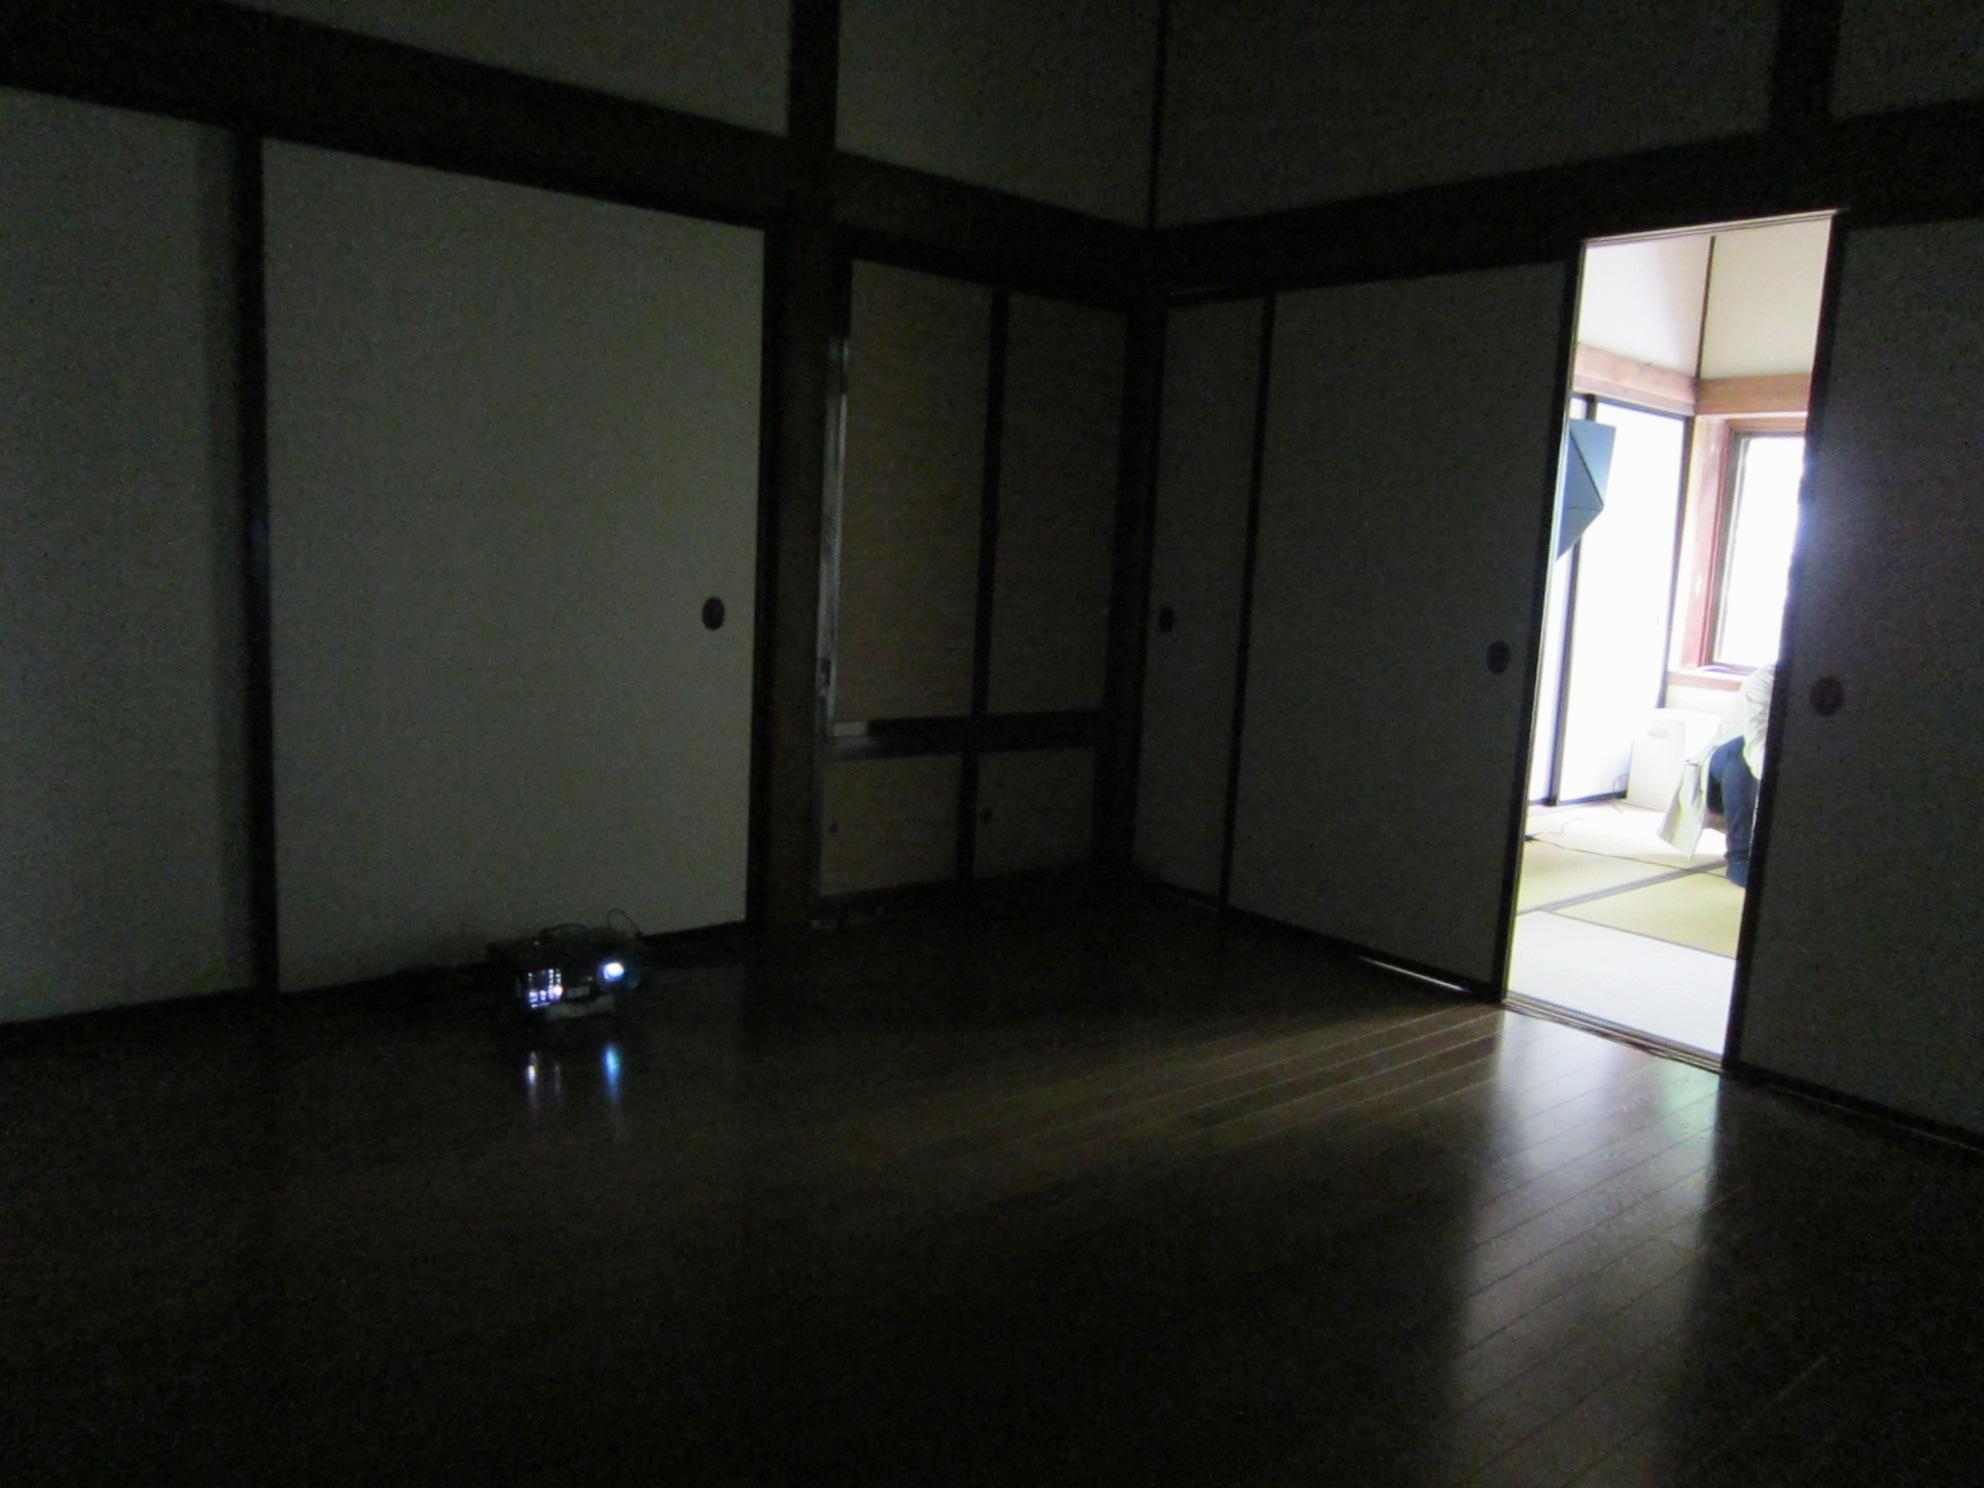 2035)「上野麗市 個展 『De\'tente デタント』」 g.犬養 4月17日(水)~4月29日(月)_f0126829_10475073.jpg